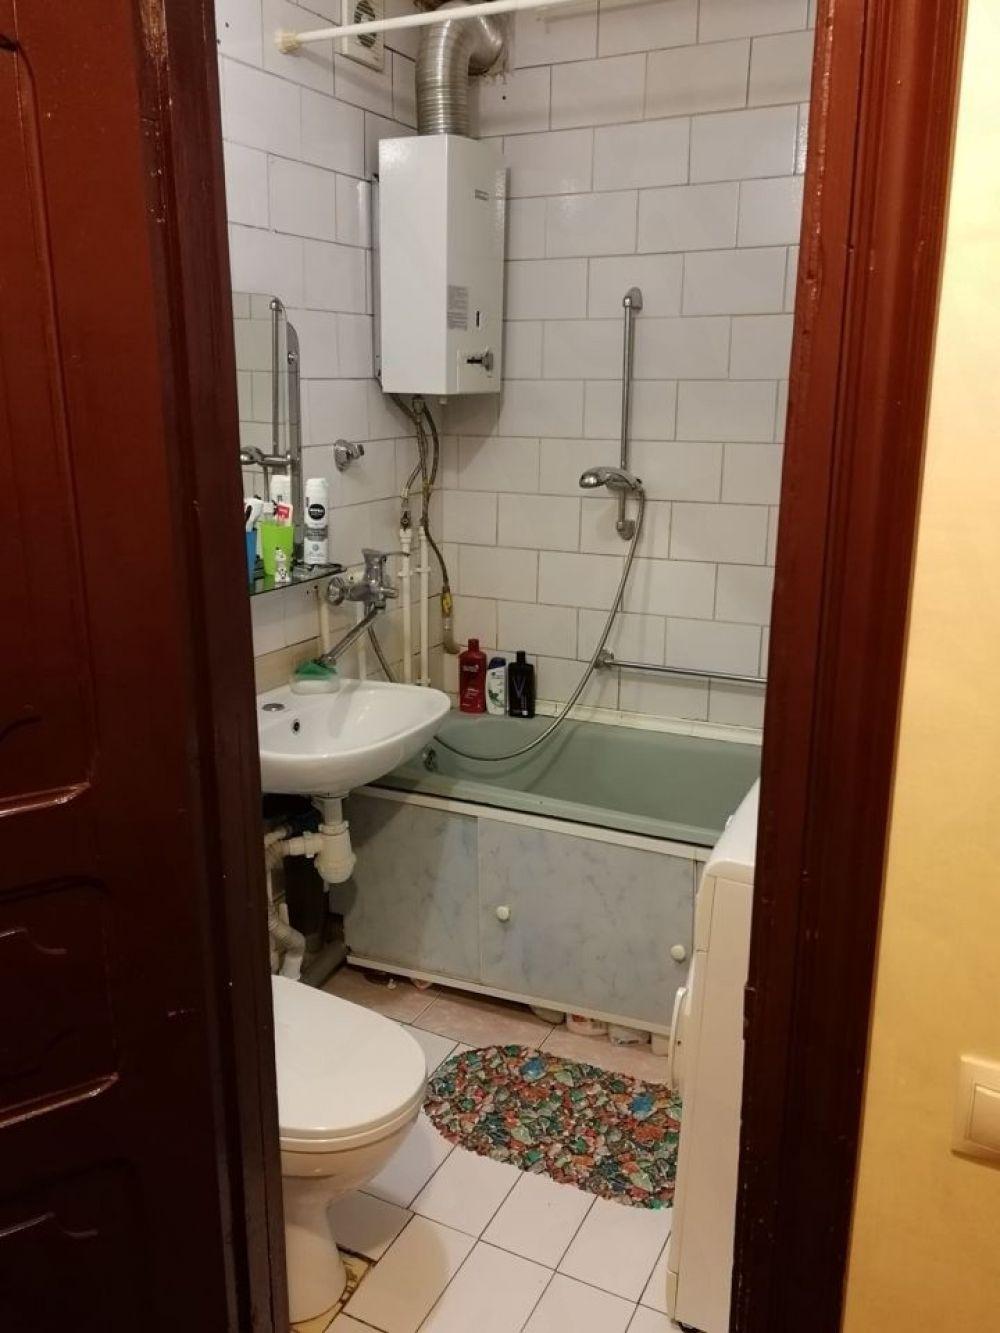 1-к квартира, Щёлково, Парковая улица, 5А, фото 16